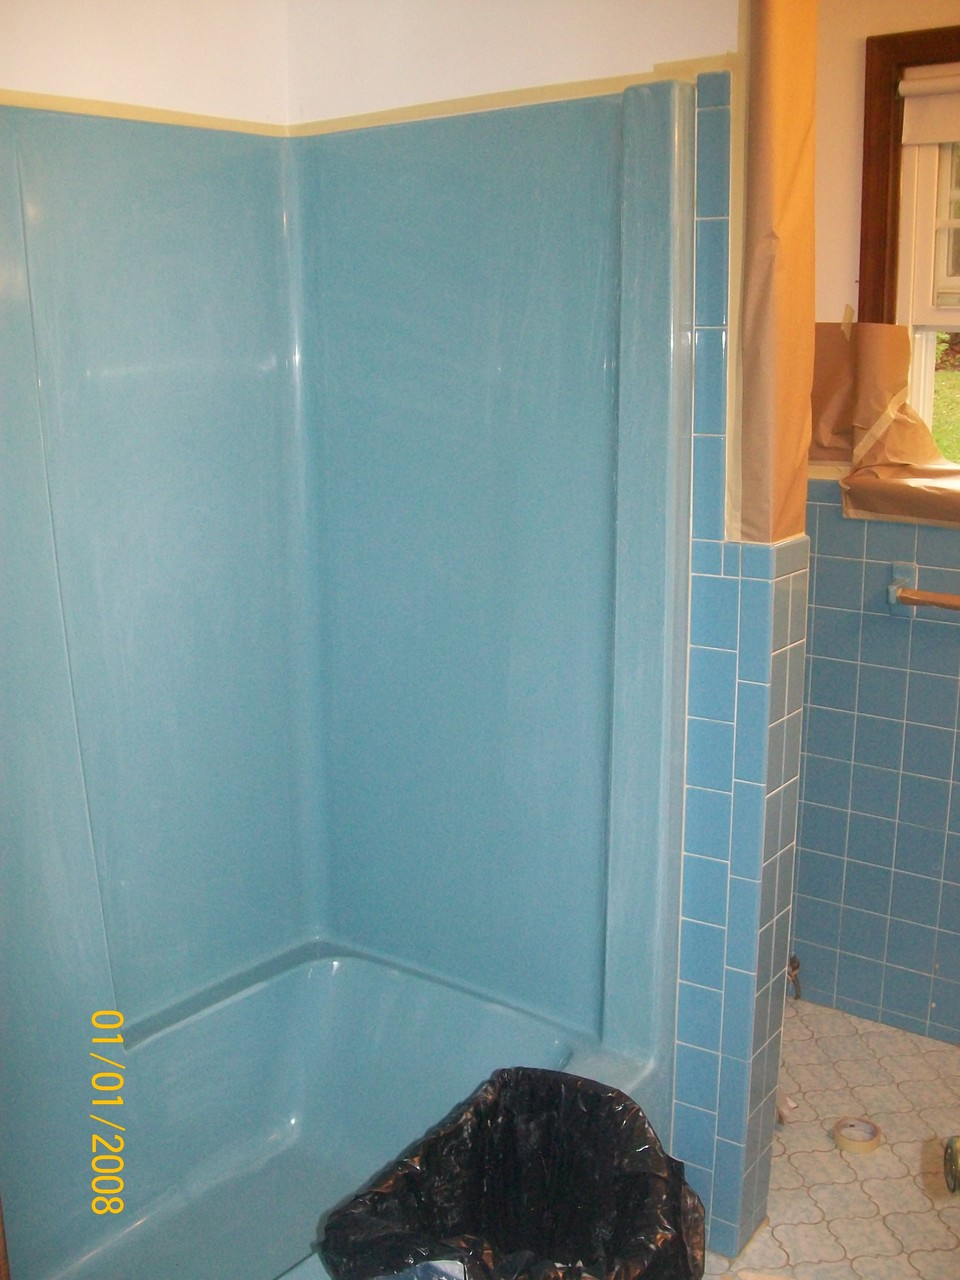 Fancy Reglazed Tub Vignette - Bathtub Ideas - dilata.info